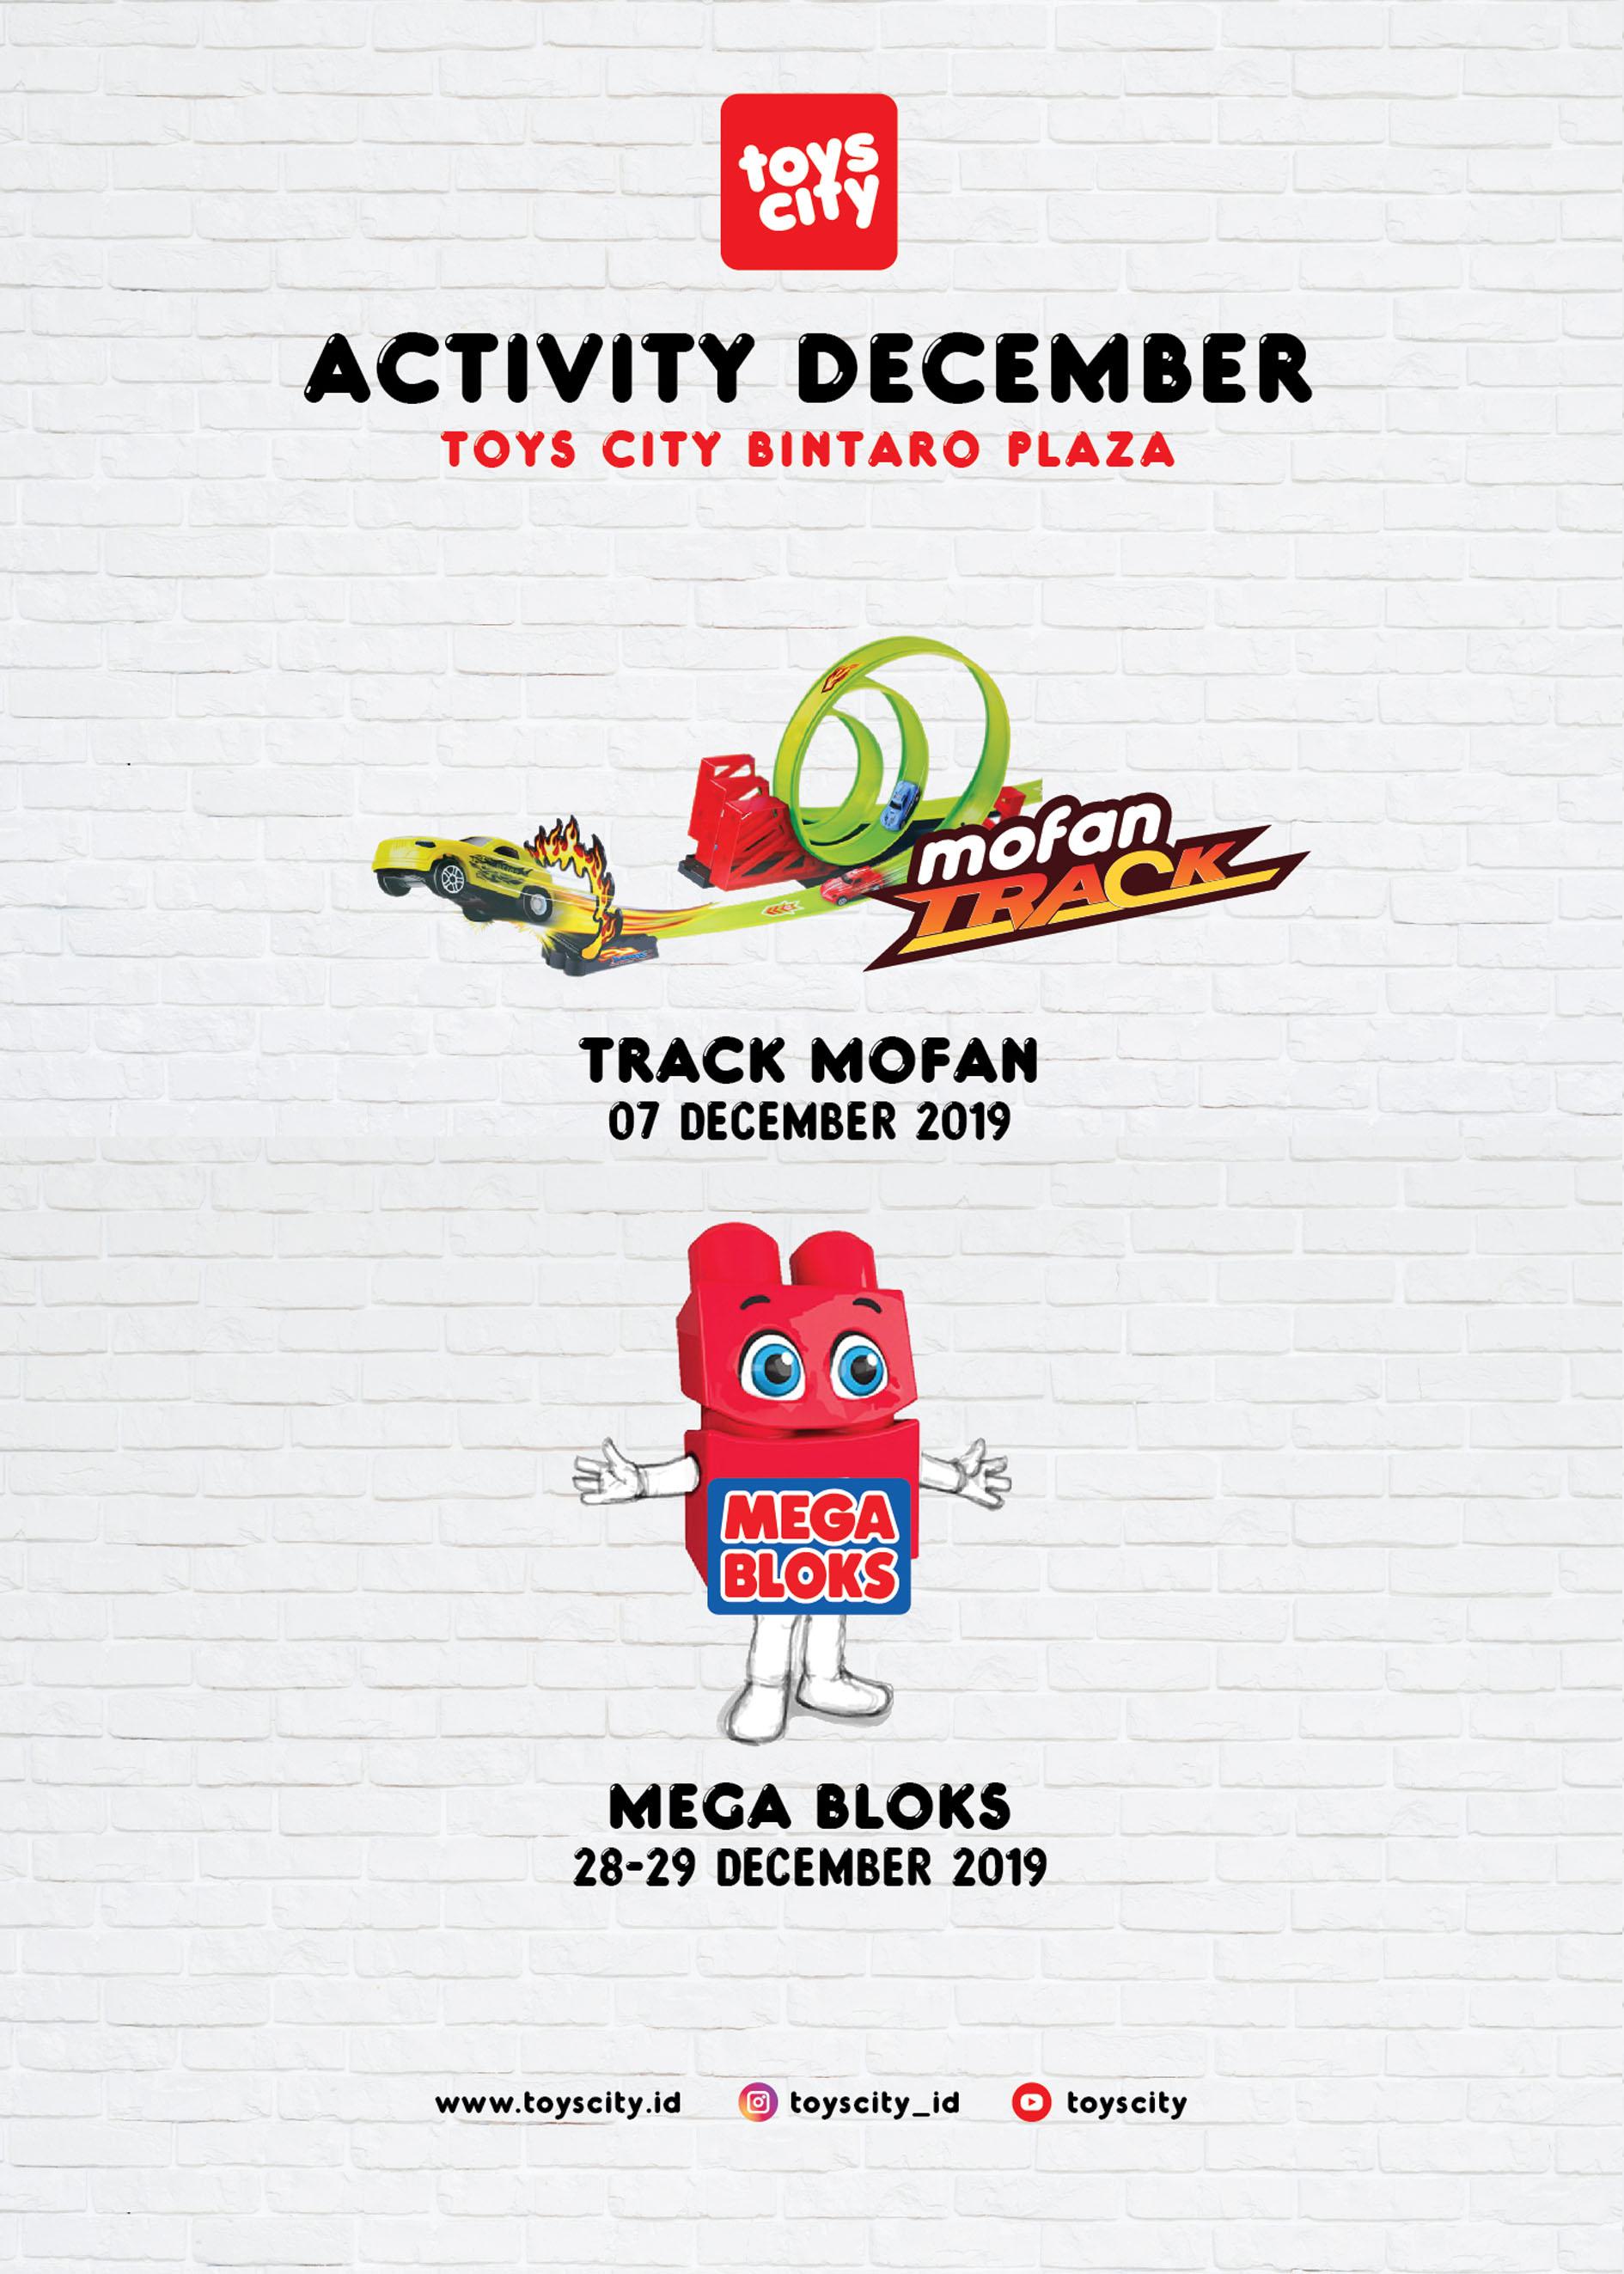 Tosycity Bintaro Plaza Mall December 2019 Activity